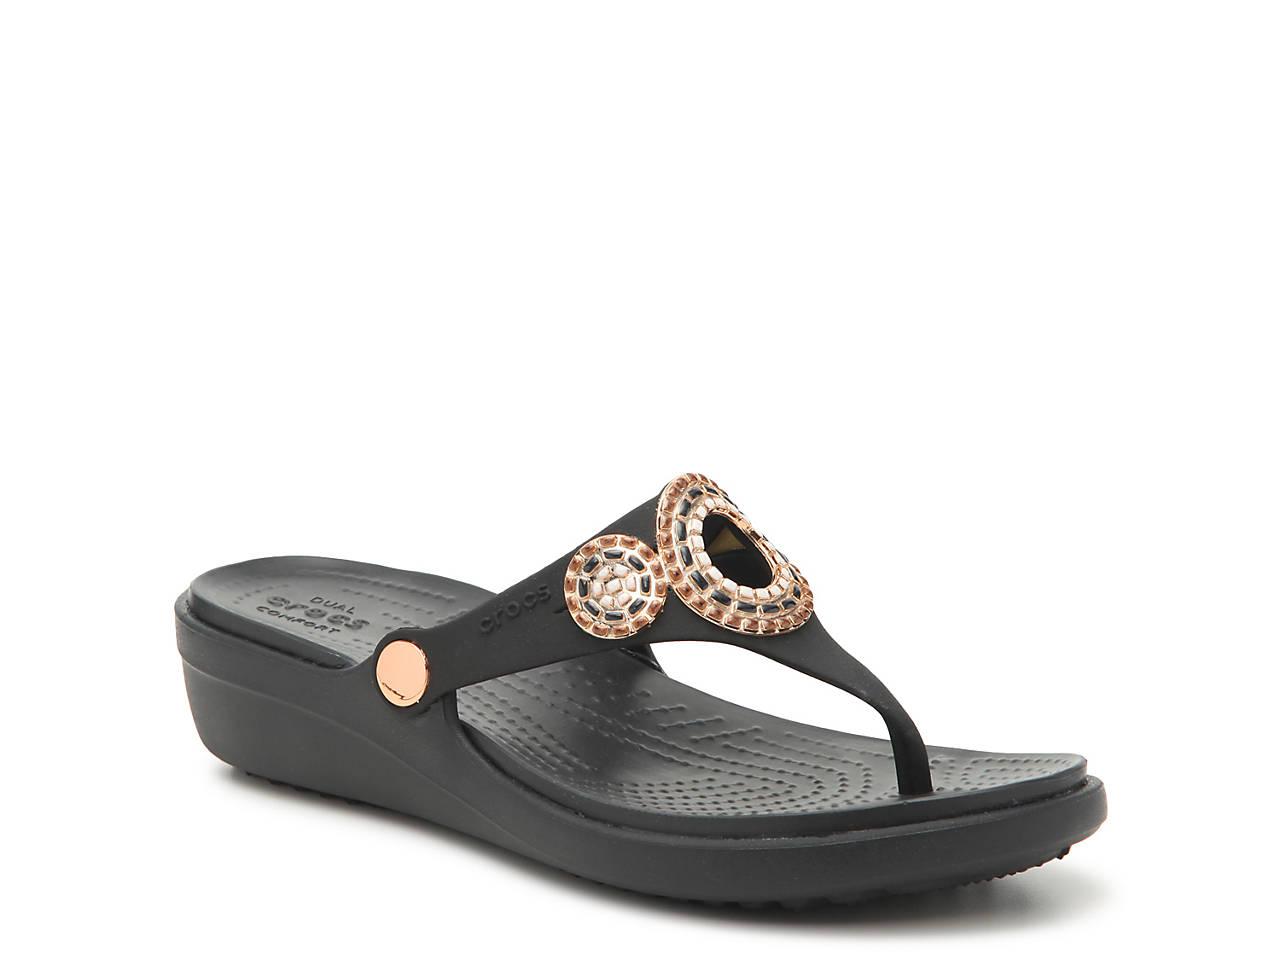 ac17f9d48949 Crocs Sanrah Wedge Sandal Women s Shoes